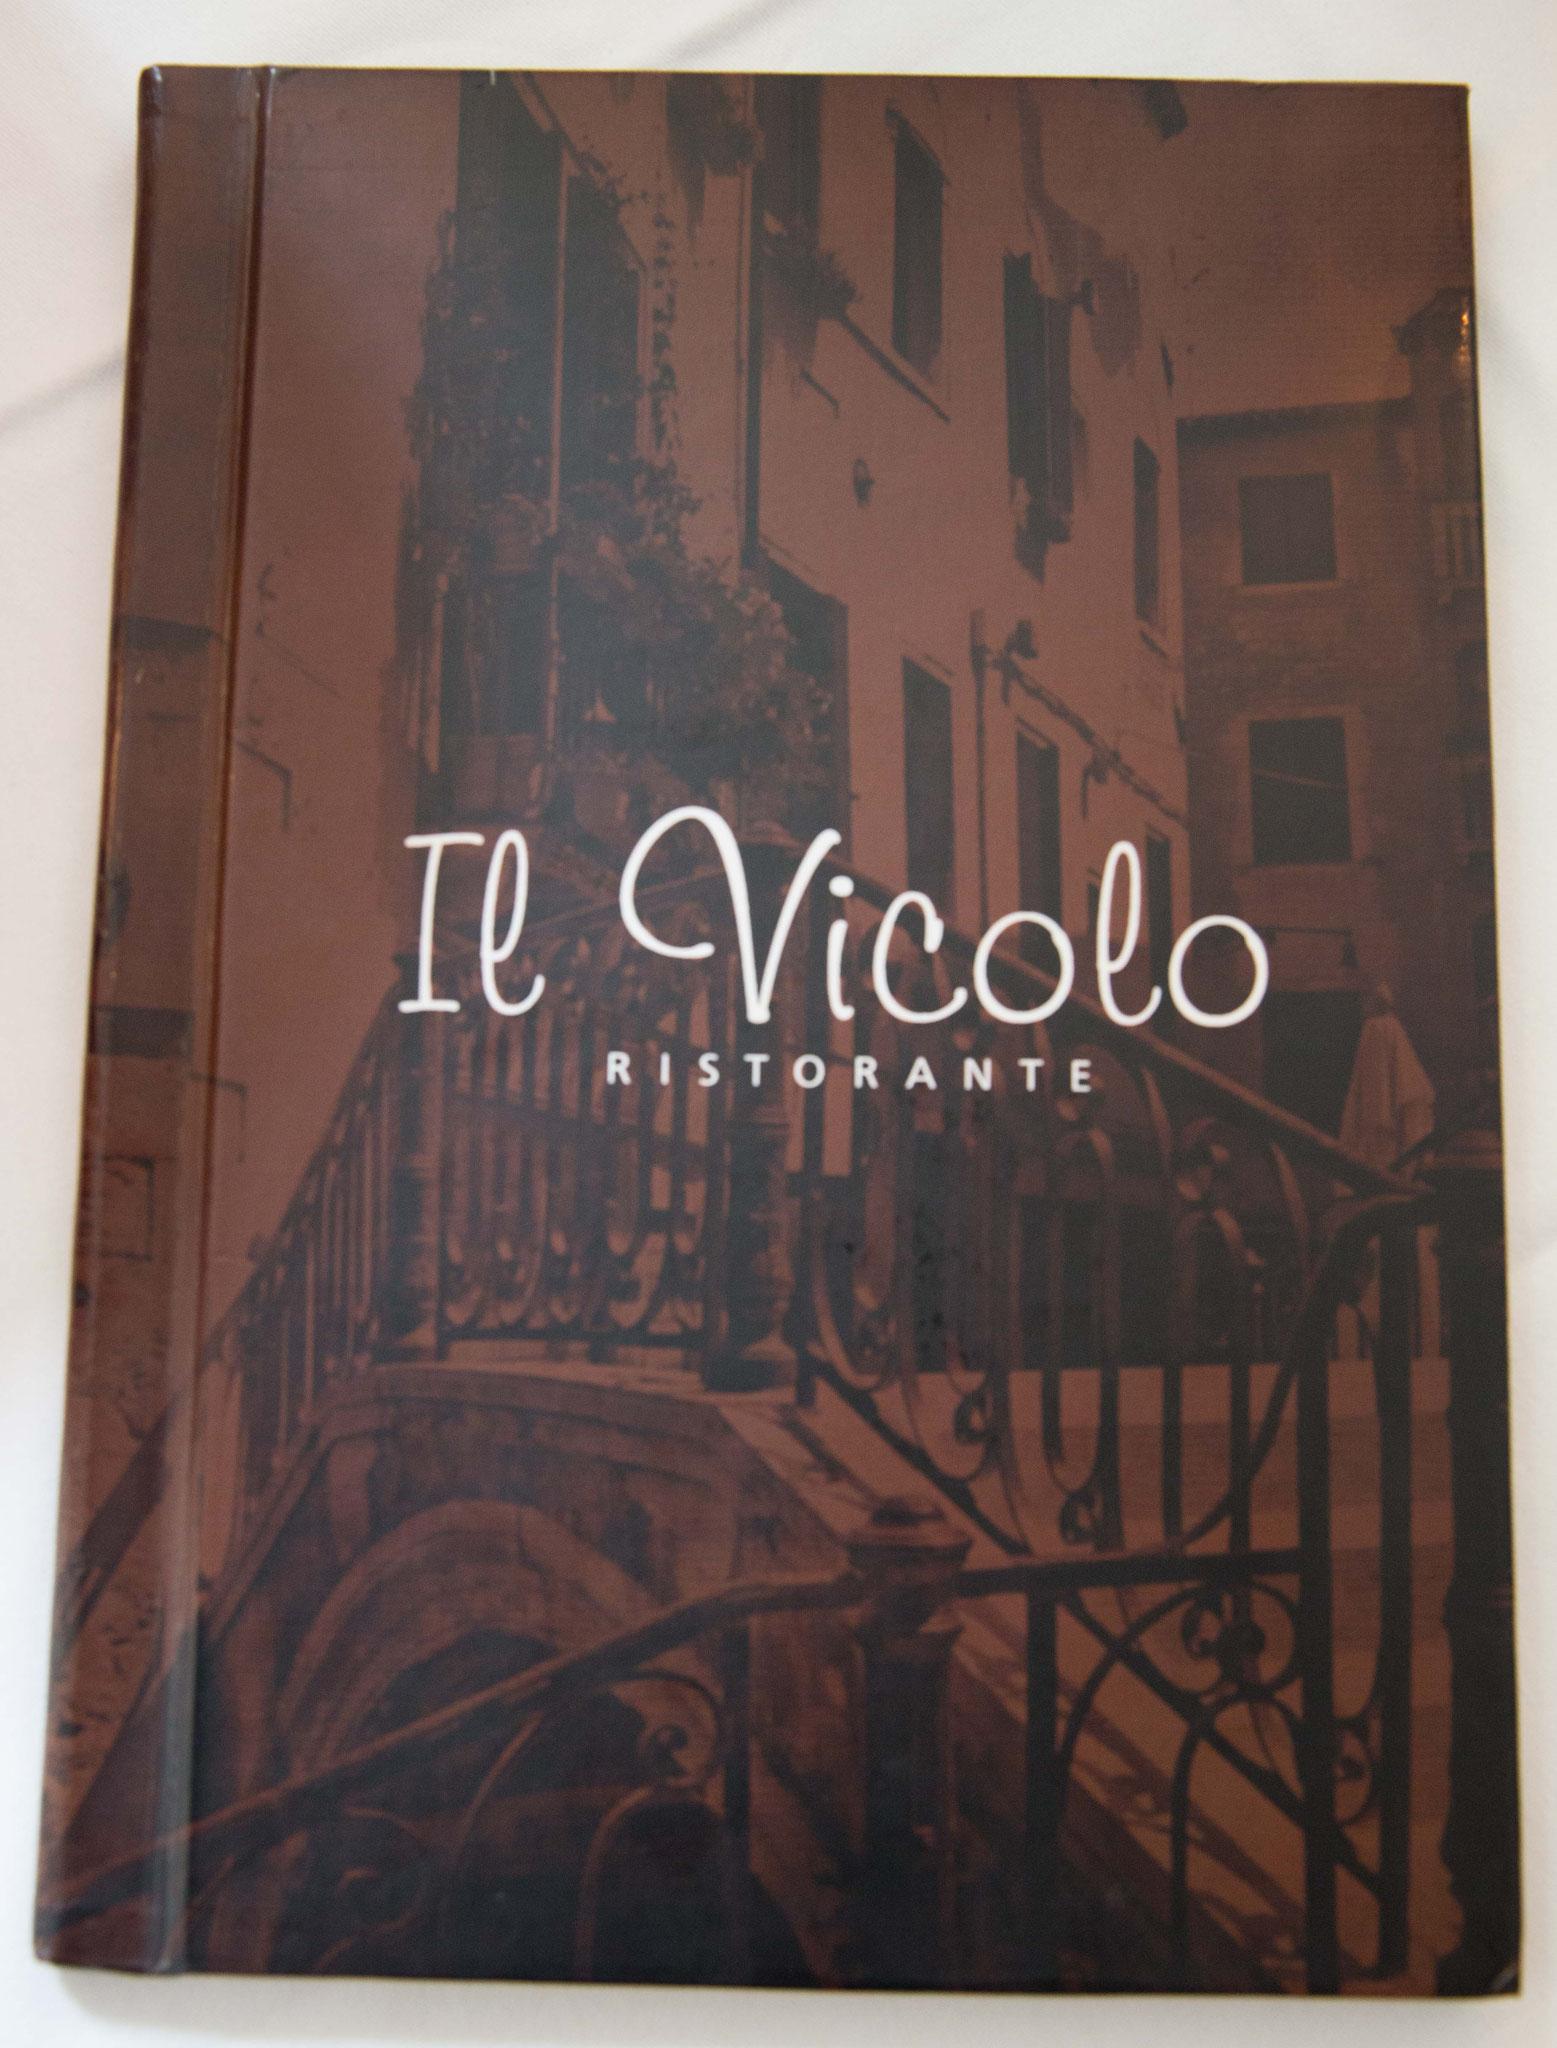 Speisen & Getränke - Ristorante il Vicolo - italienische Spezialitäten